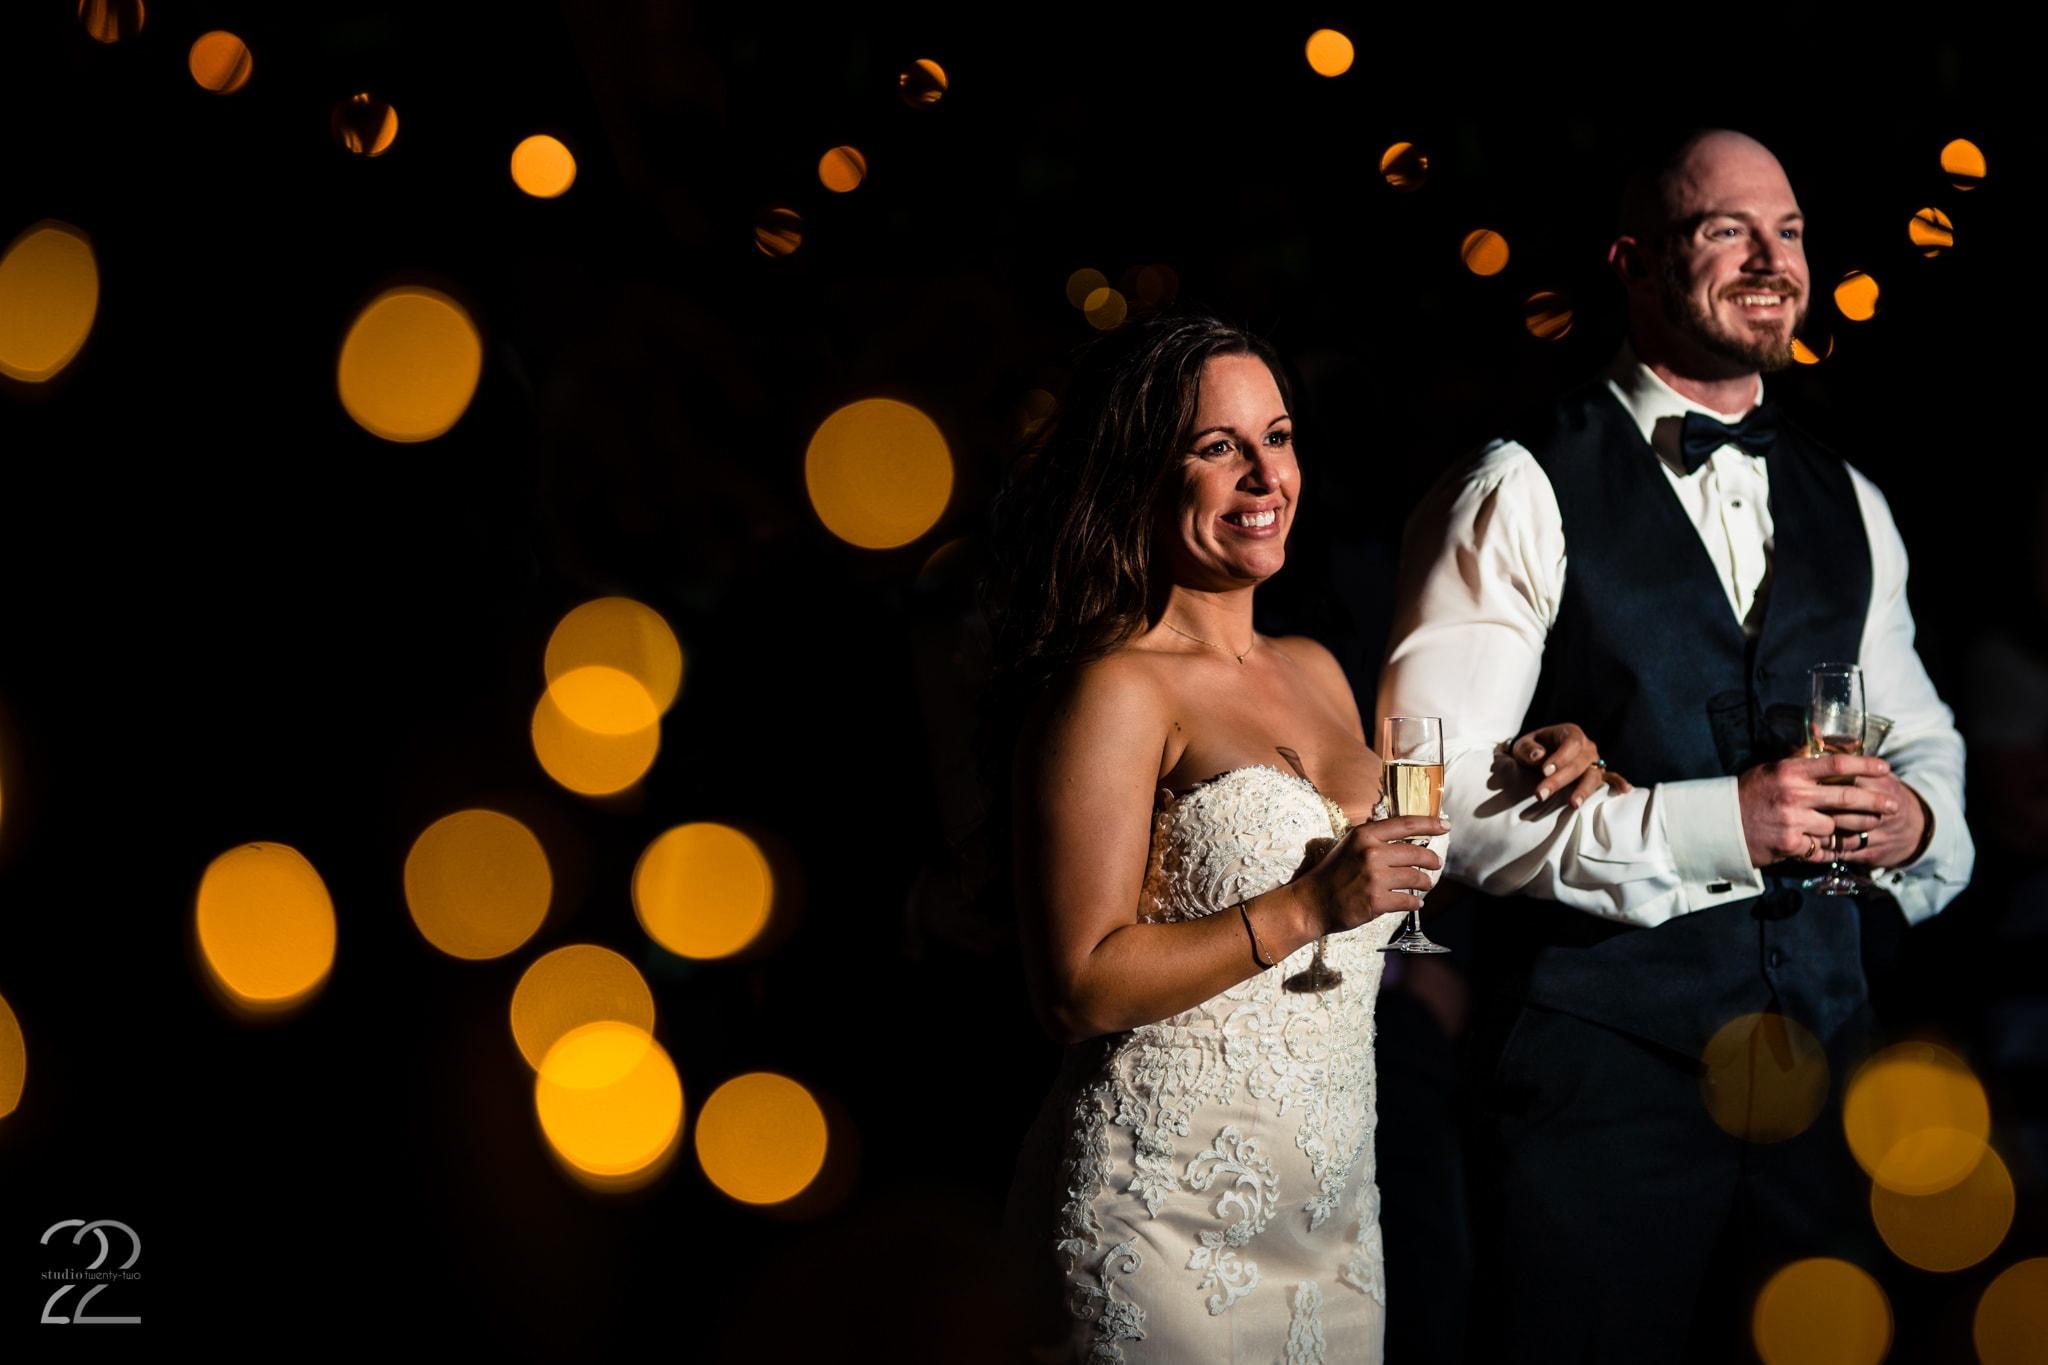 Sigma 105 Art Review - Destination Wedding Photographer - Studio 22 Photography